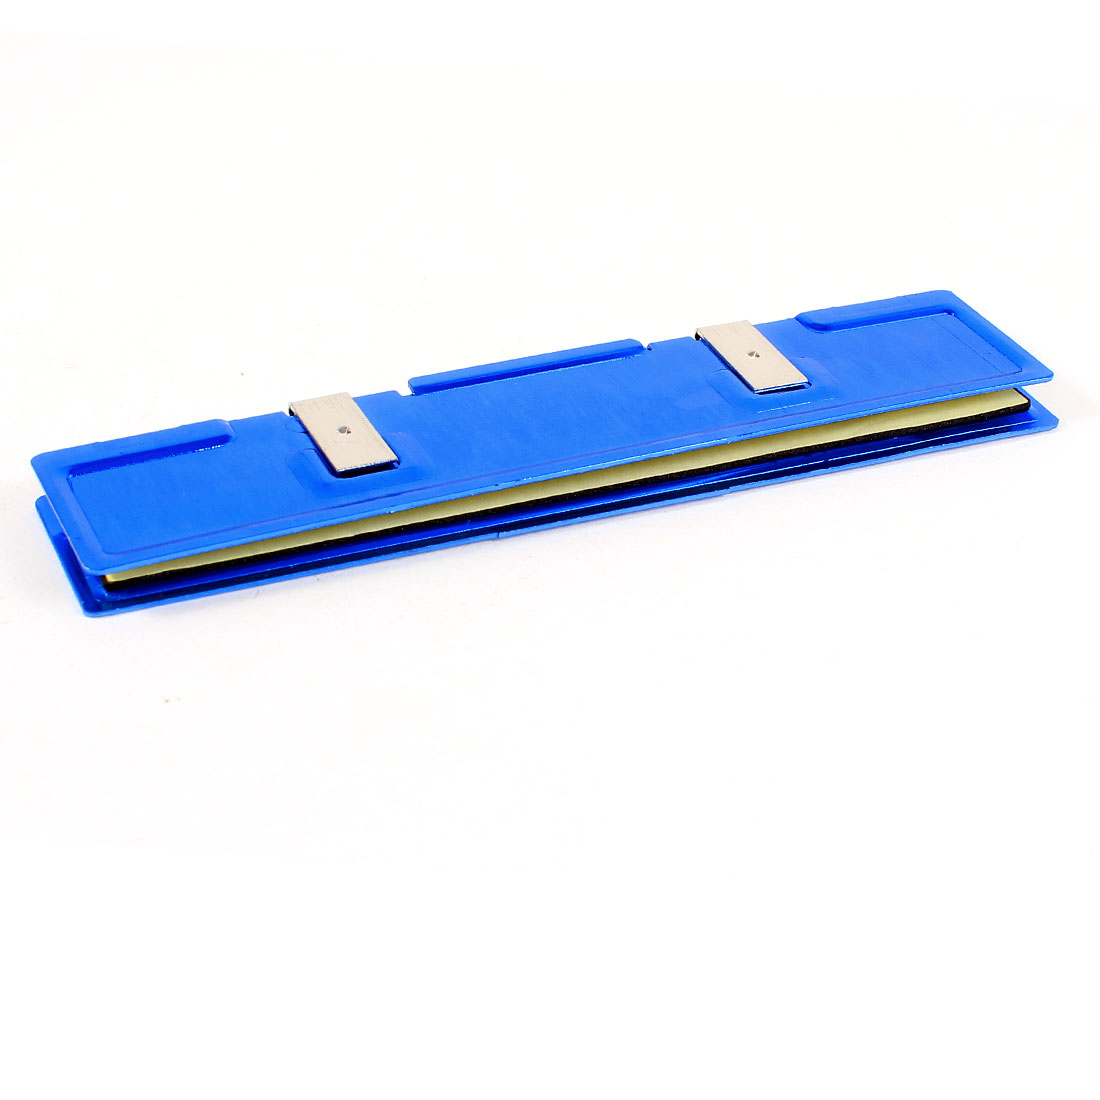 Blue Aluminum Heatsink Shim Spreader Cooling for DDR DDR2 DDR3 RAM Memory